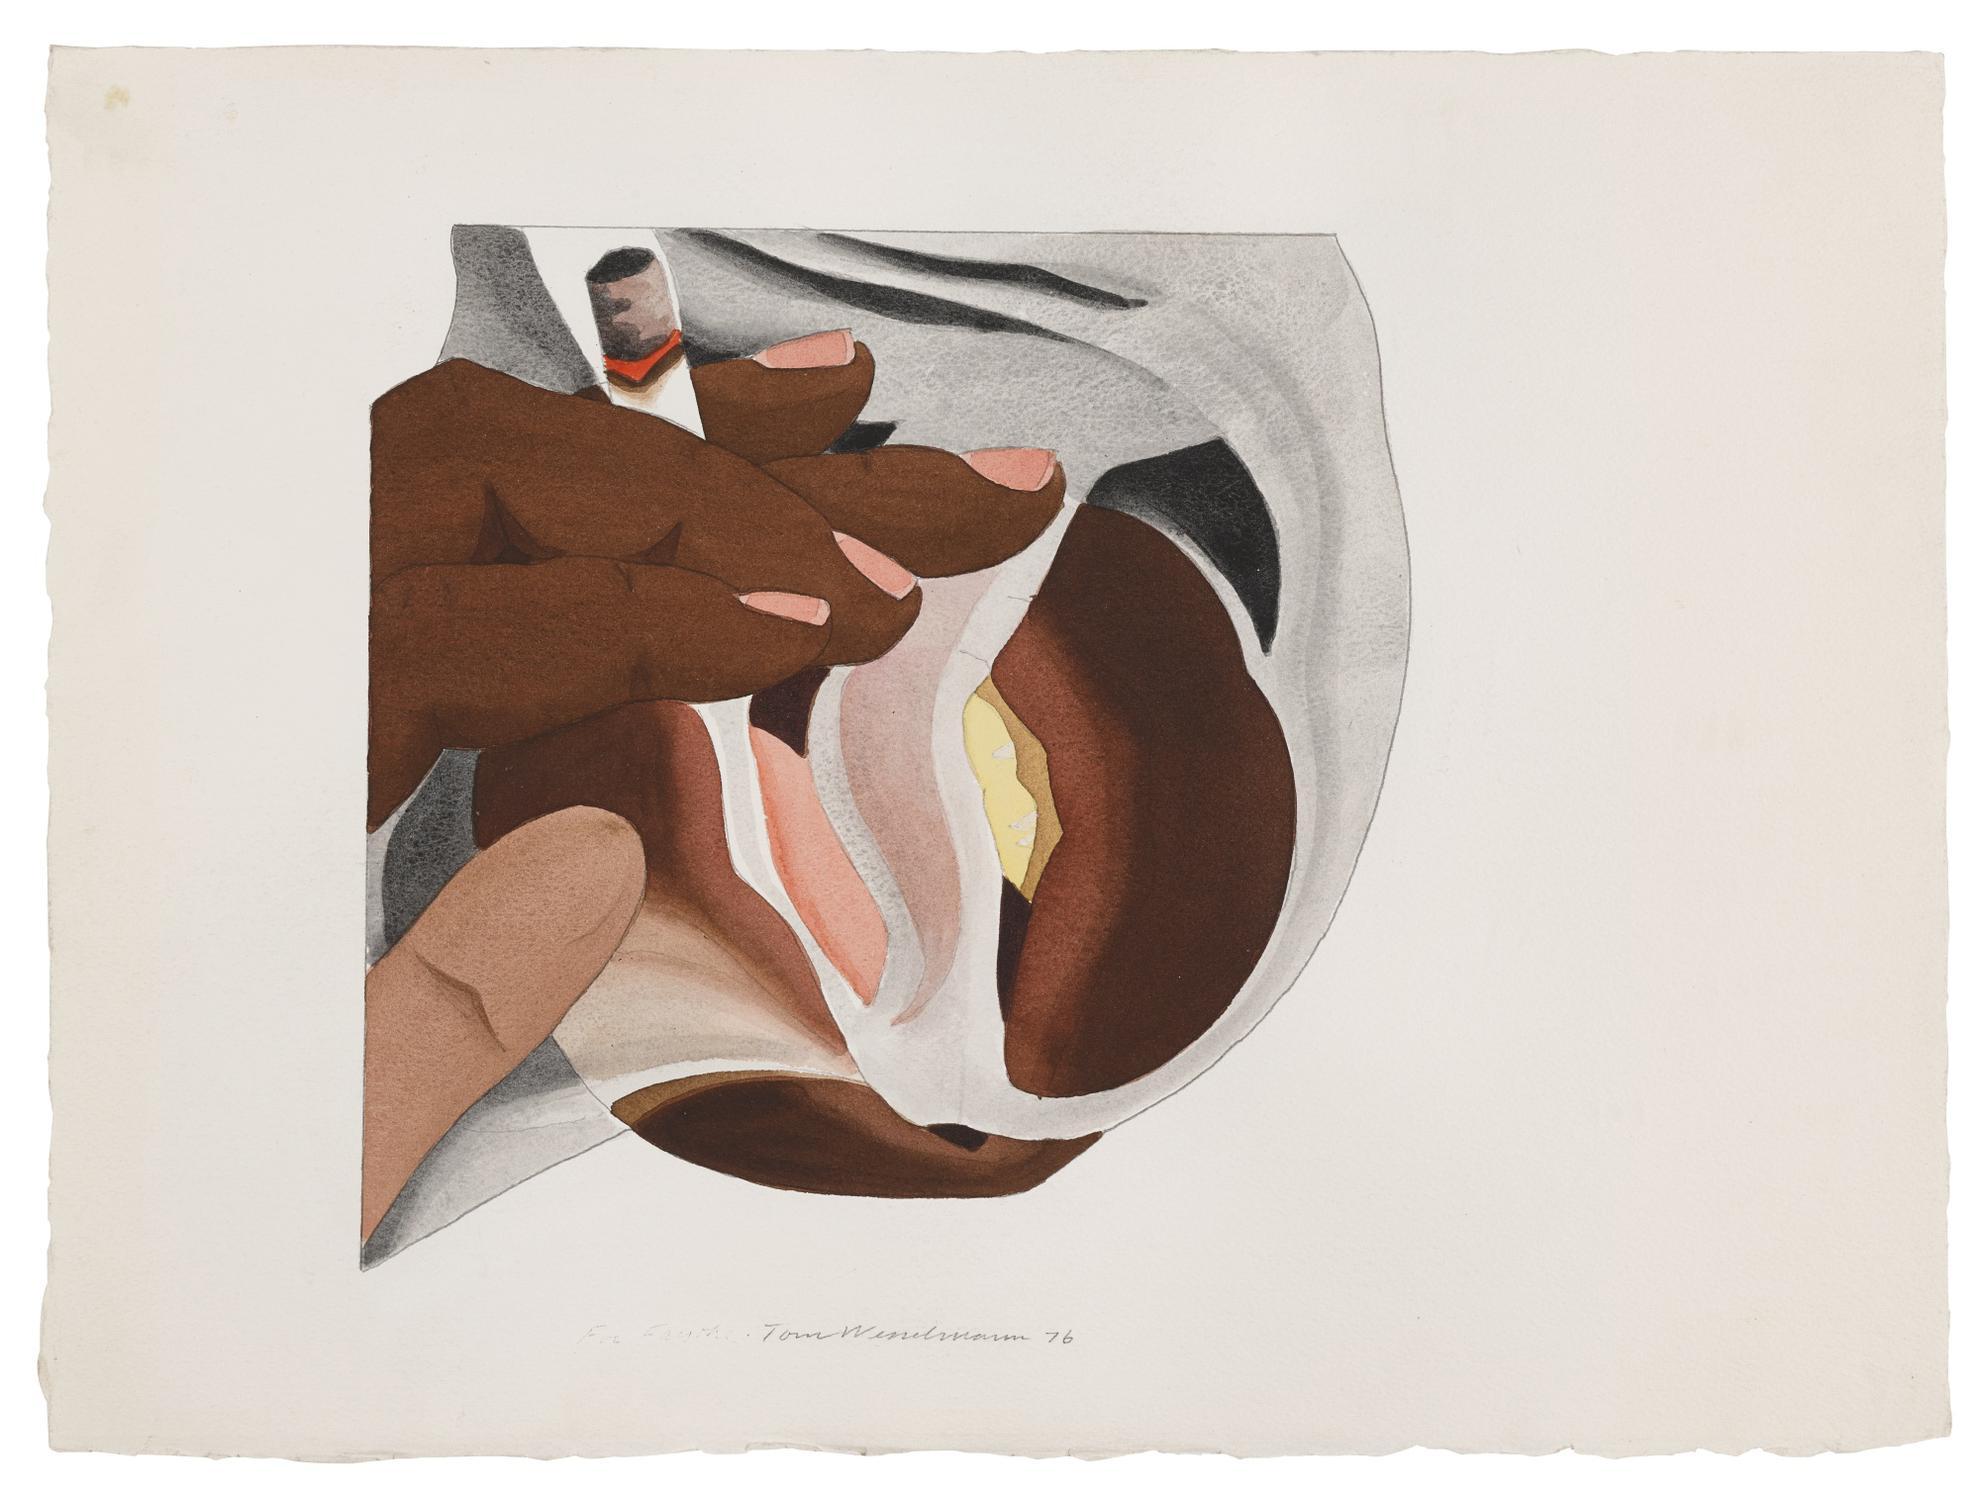 Tom Wesselmann-From Smoker #24-1976